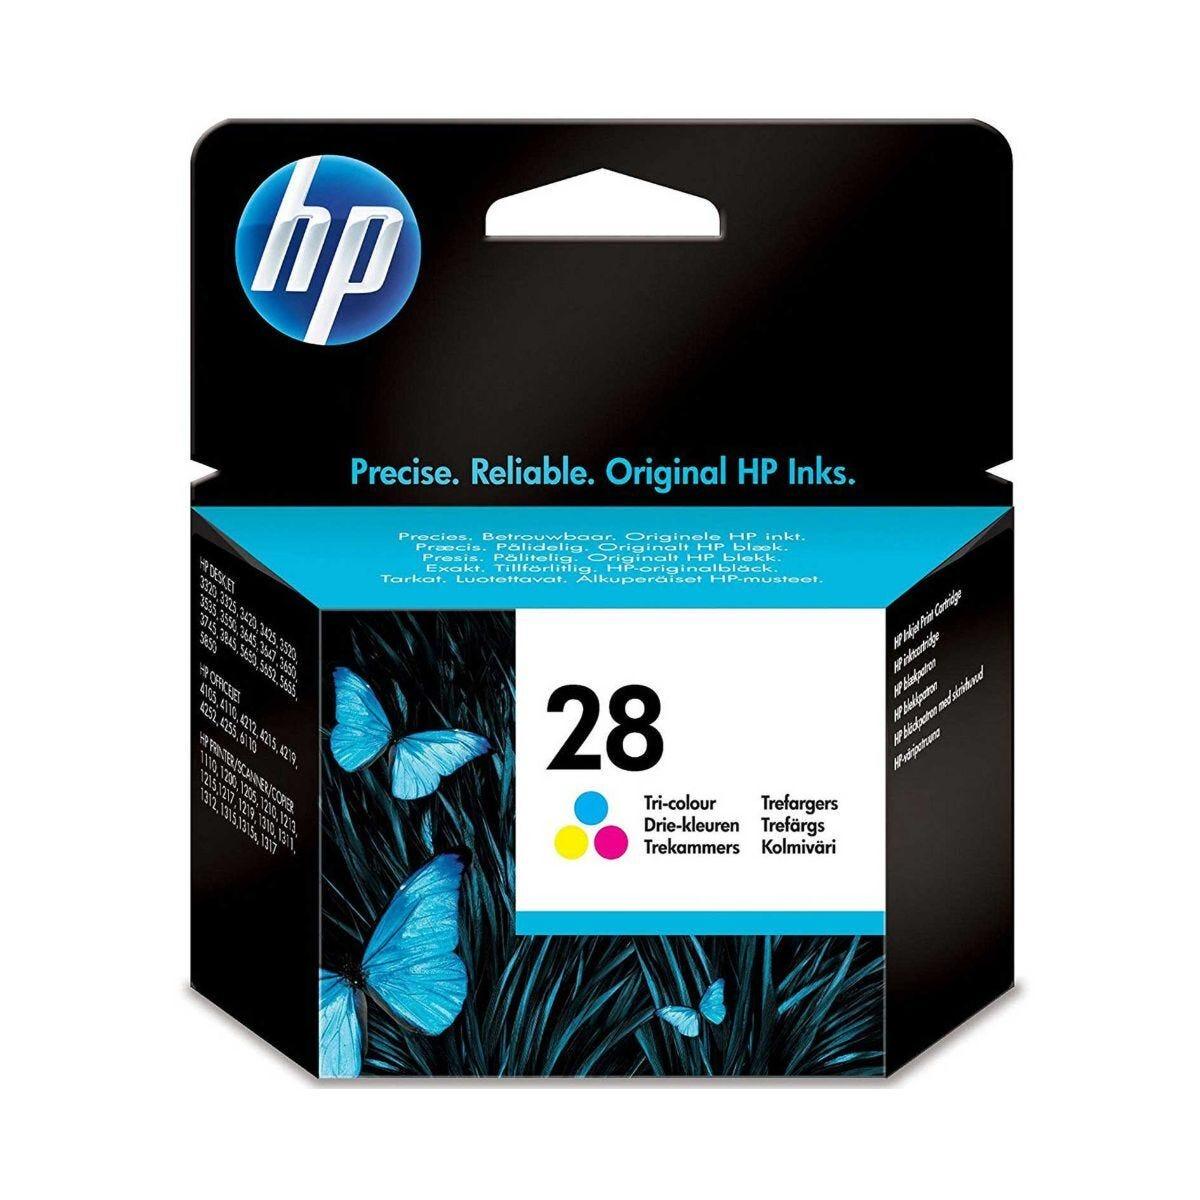 HP 28 Tri Colour Printer Ink Cartridge